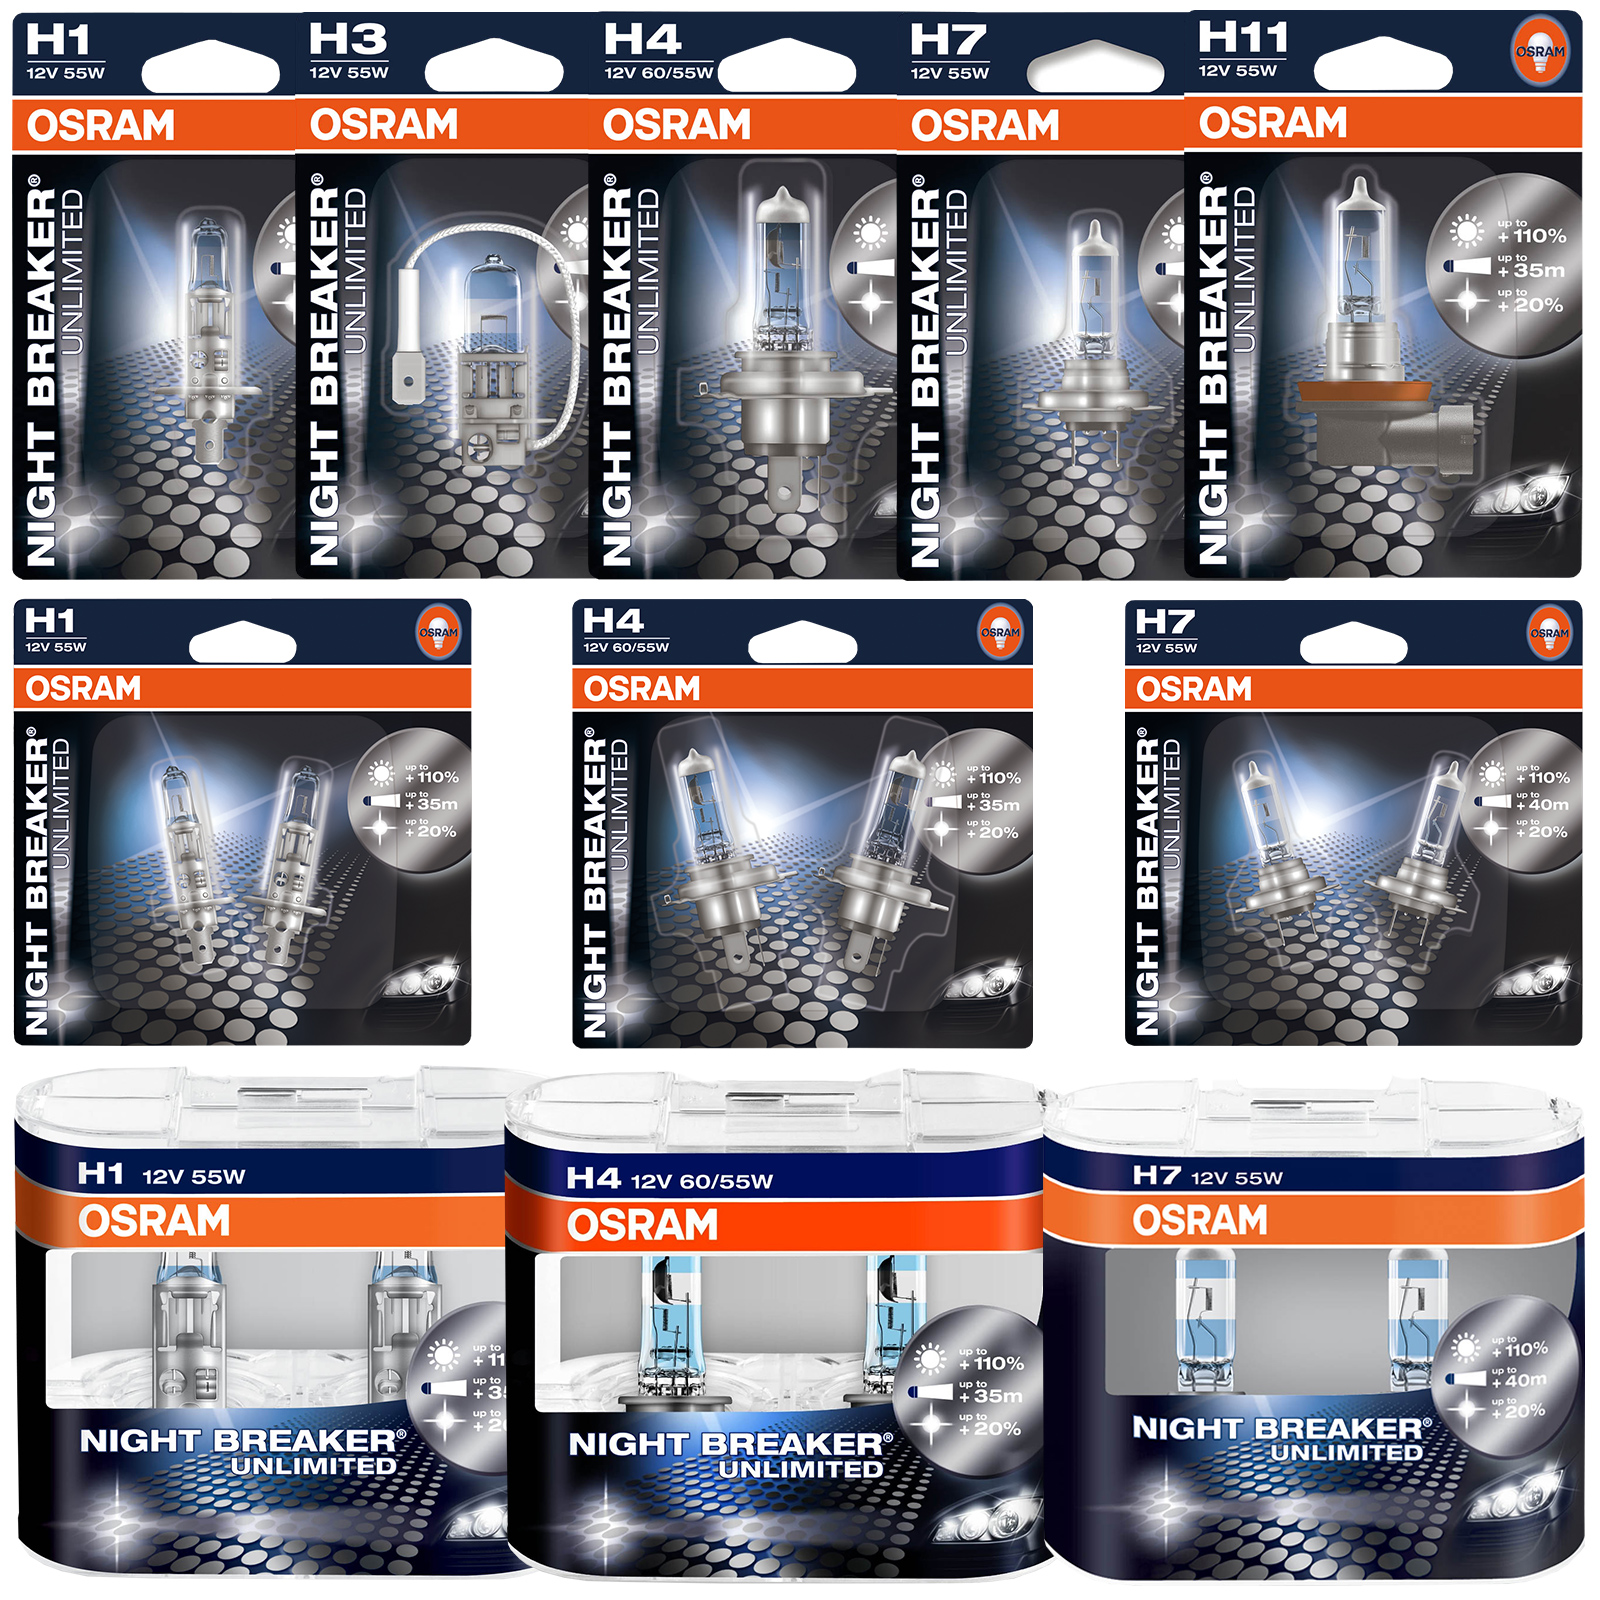 osram night breaker unlimited car bulbs h1 h3 h4 h7 h11 hb3 hb4 fittings here ebay. Black Bedroom Furniture Sets. Home Design Ideas